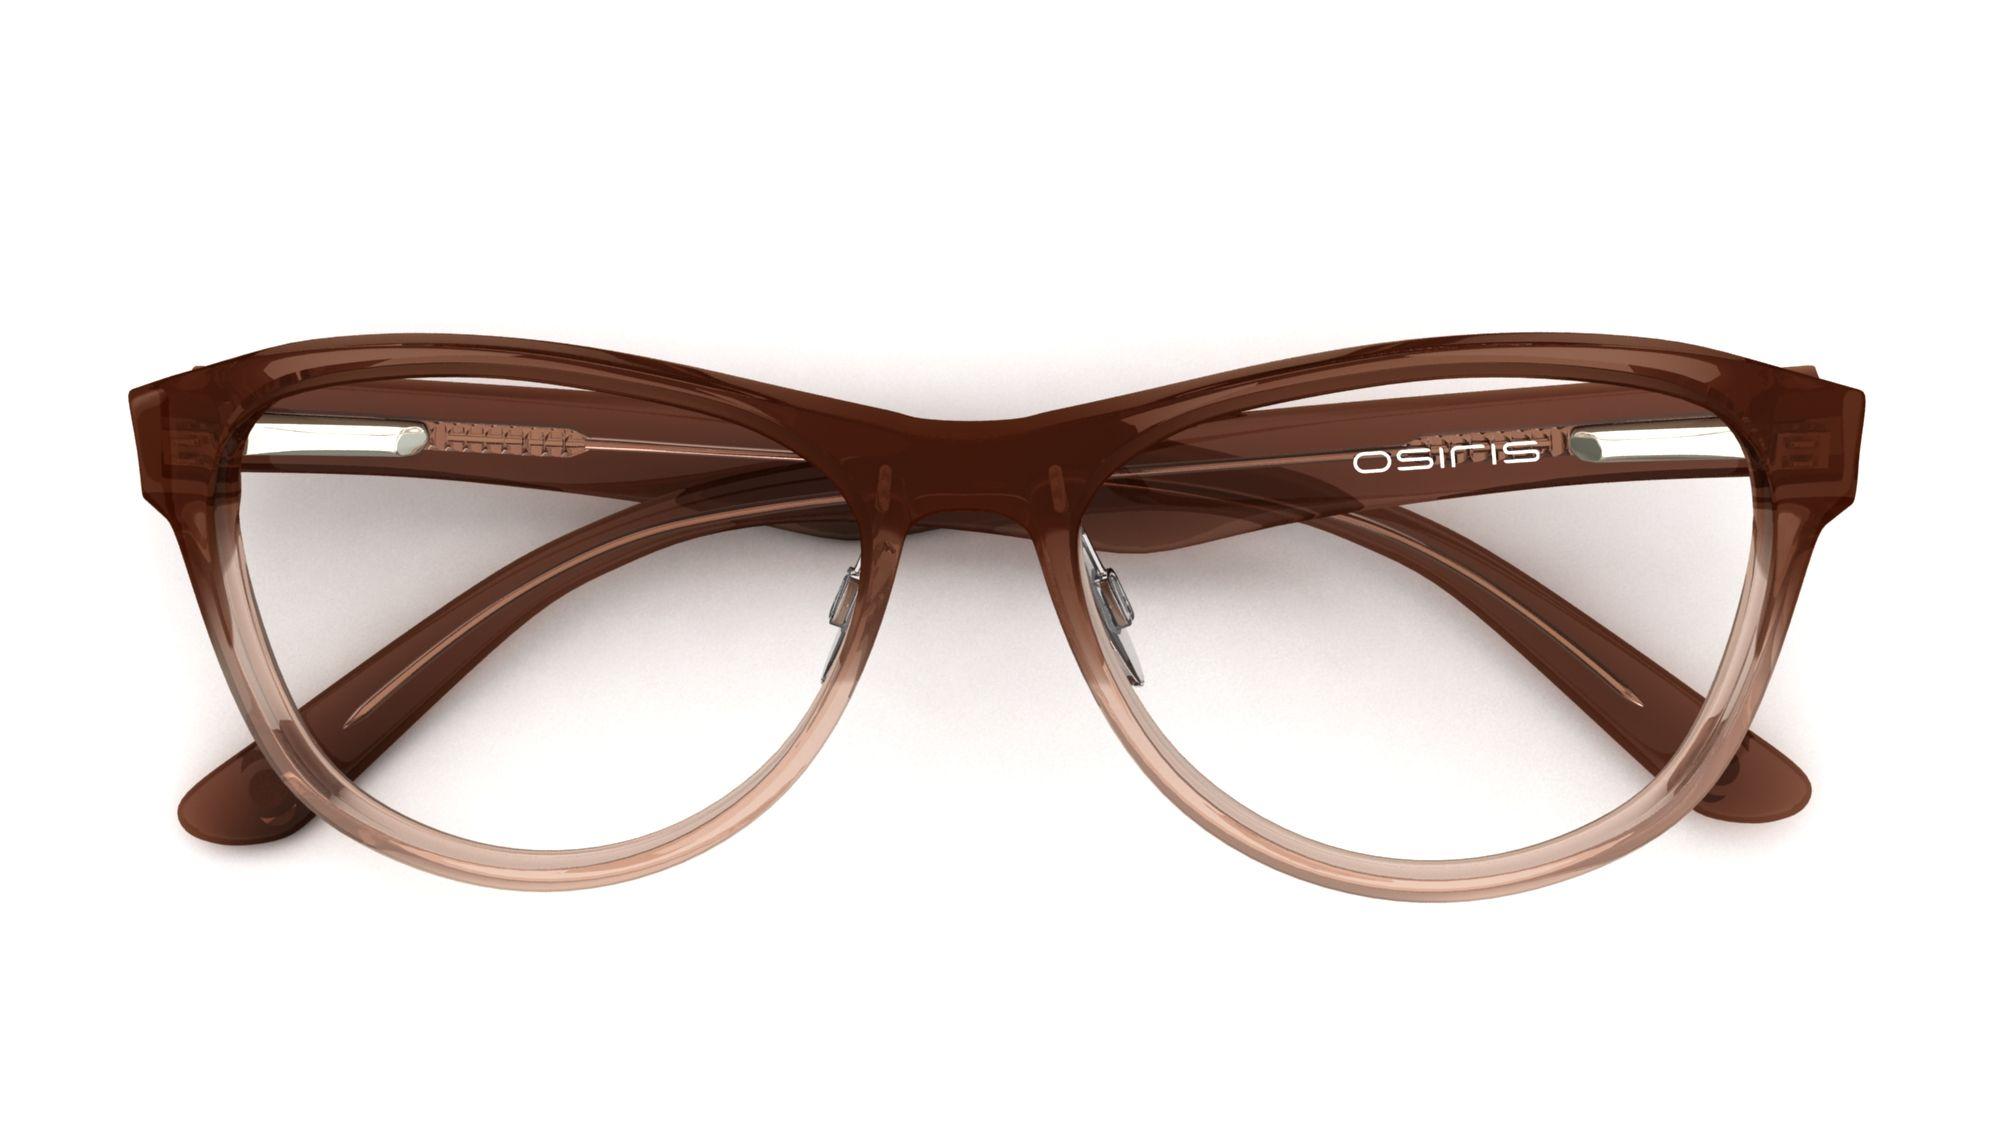 ff200f01dad1 Osiris glasses - OSIRIS B57 | Frames | Glasses, Womens glasses, Glass